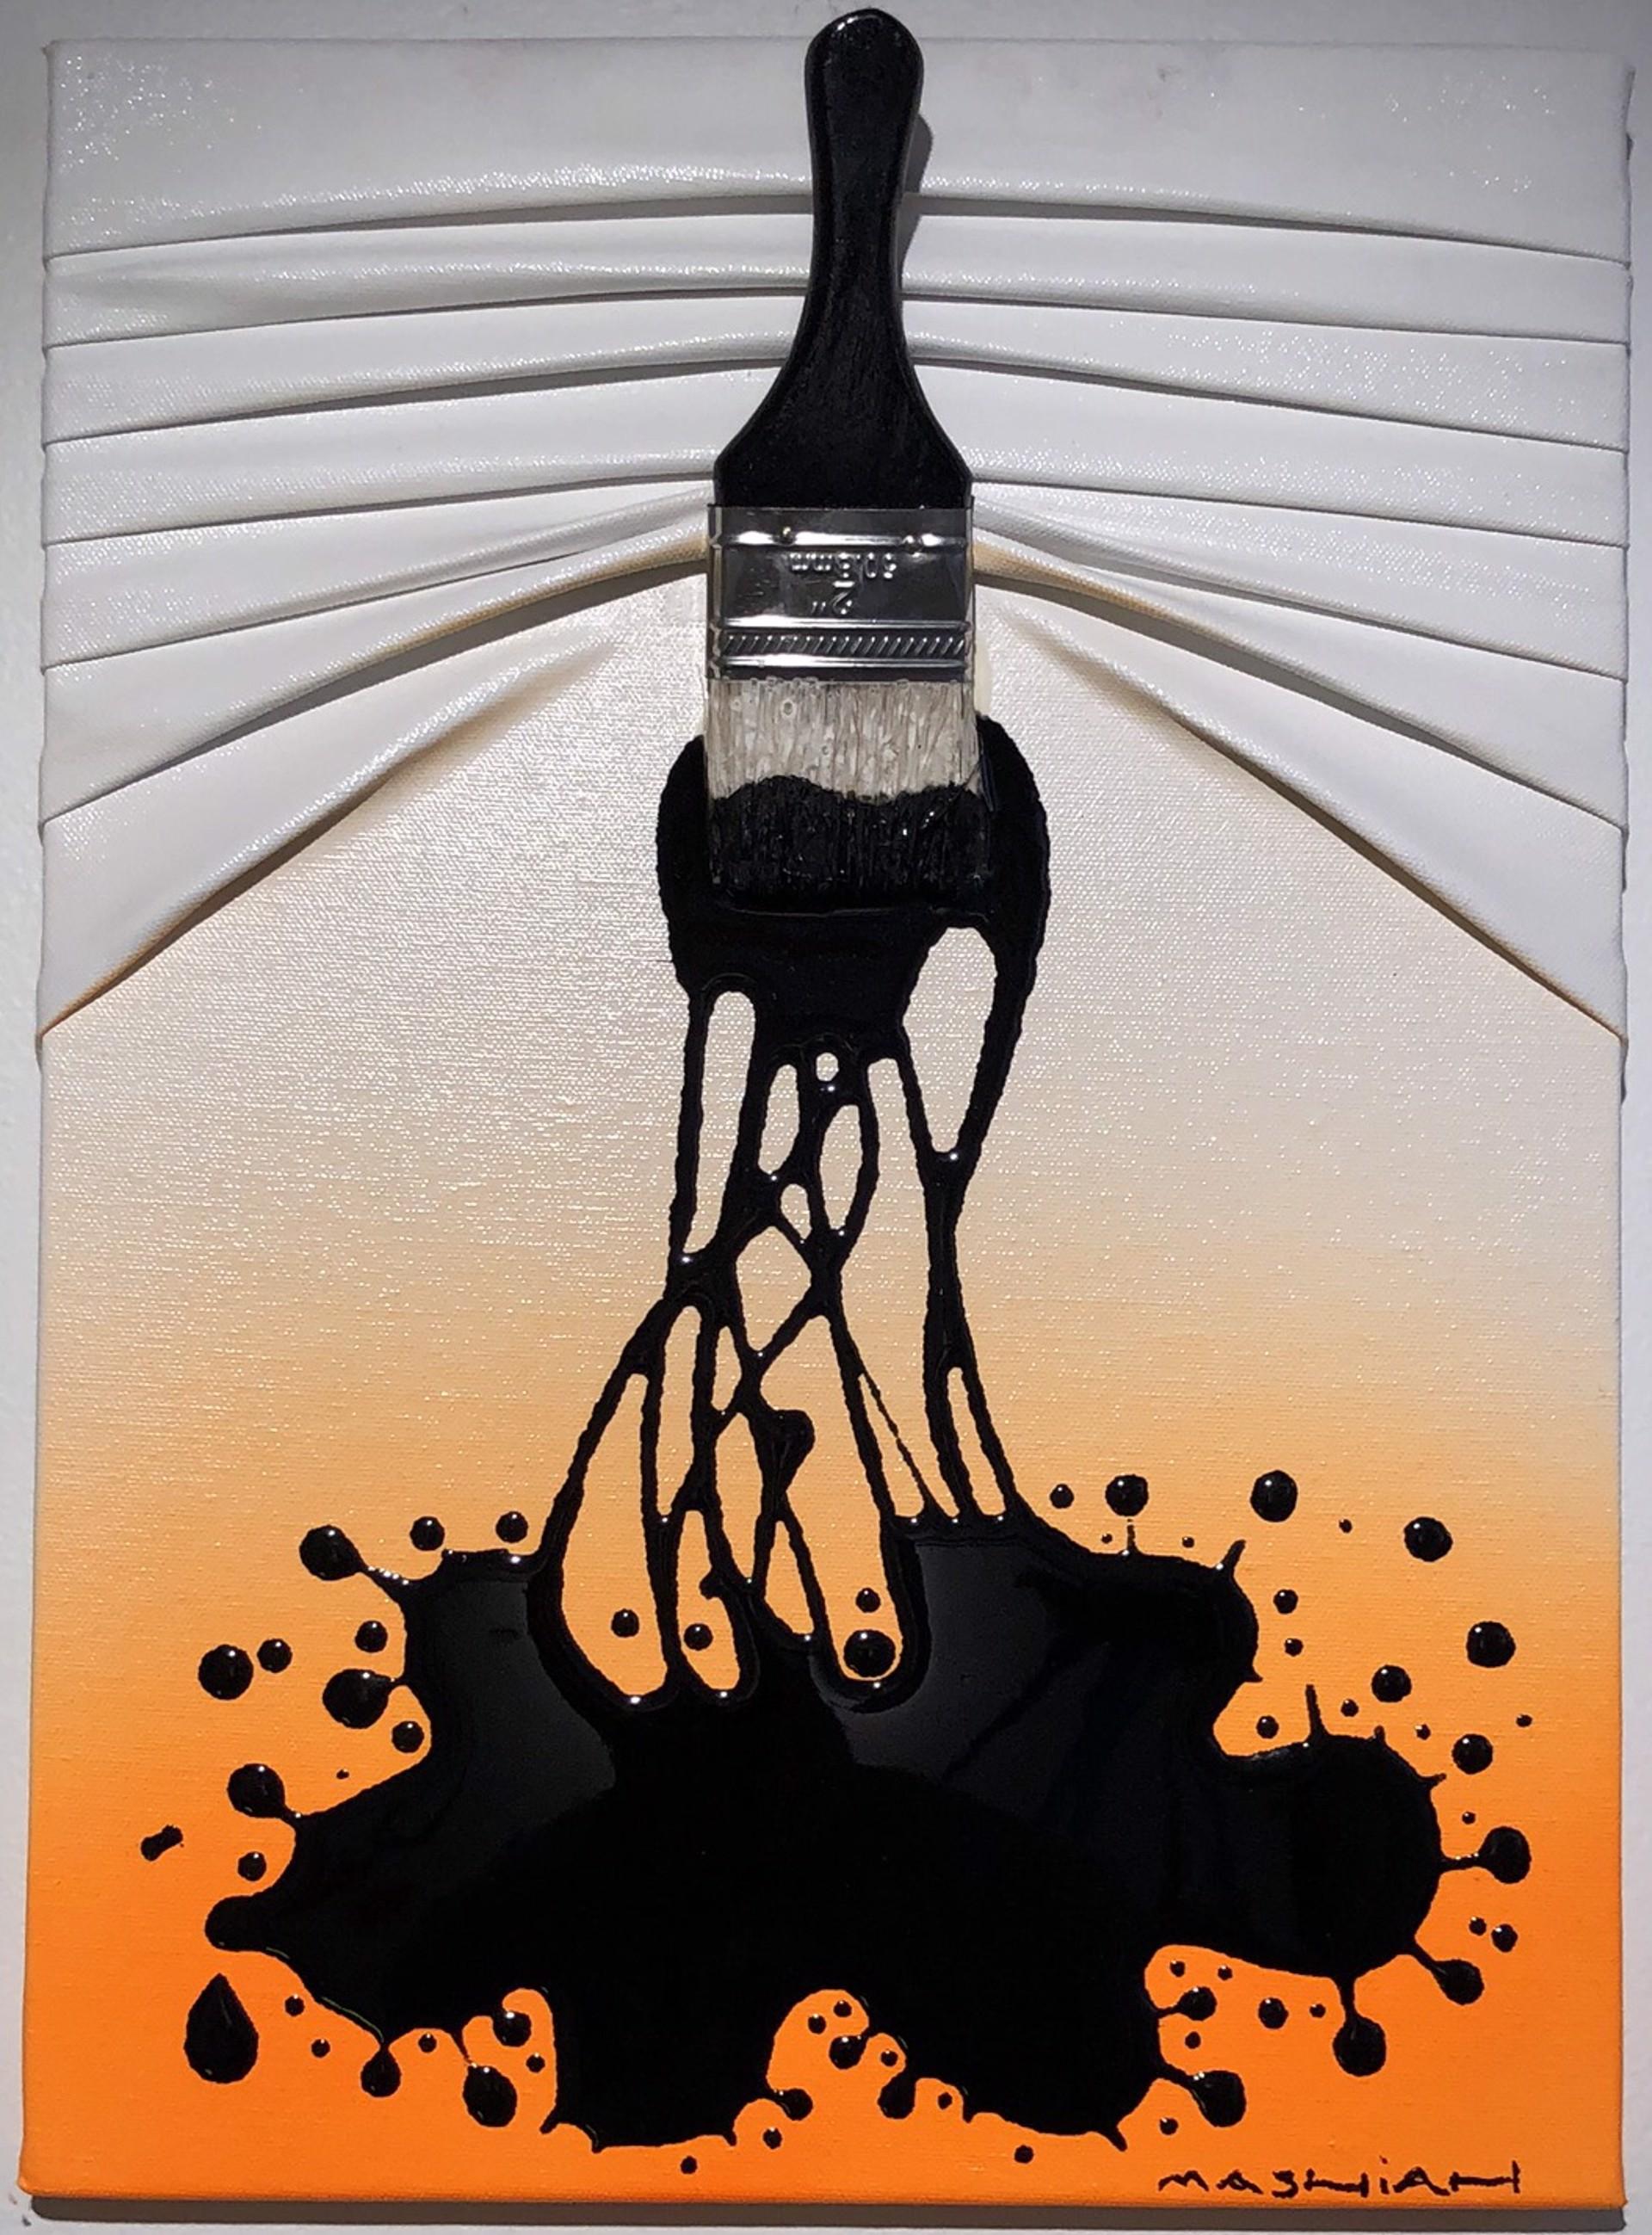 """Let's Paint"" mini, Black splash on White/Orange by Efi Mashiah"